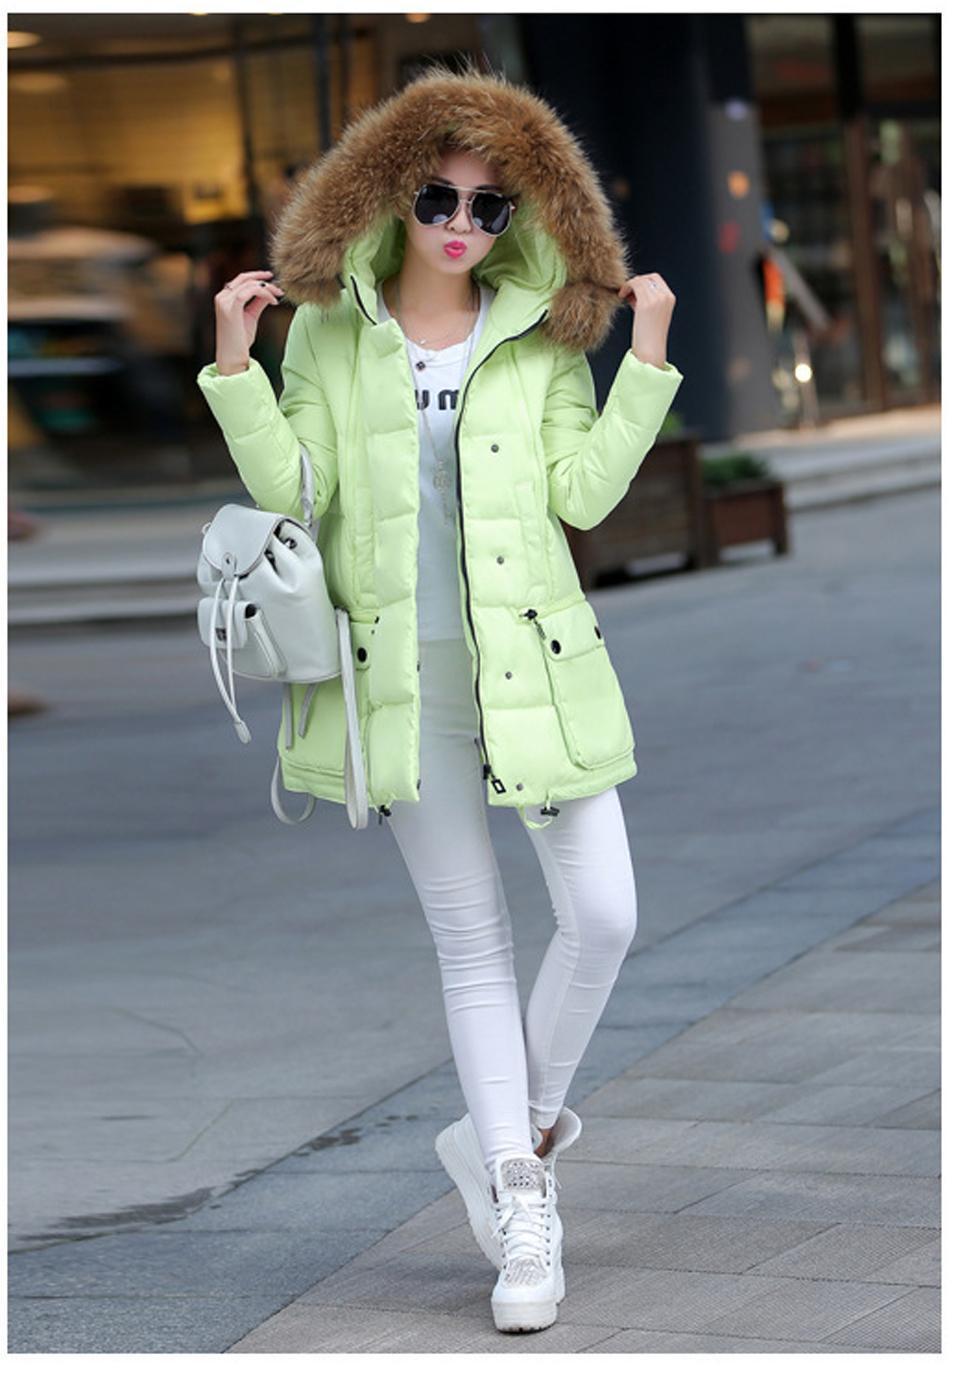 2015 winter women jacket long super large collar parka coat cloak plus size thick Nagymaros collar down jacket wide-waisted